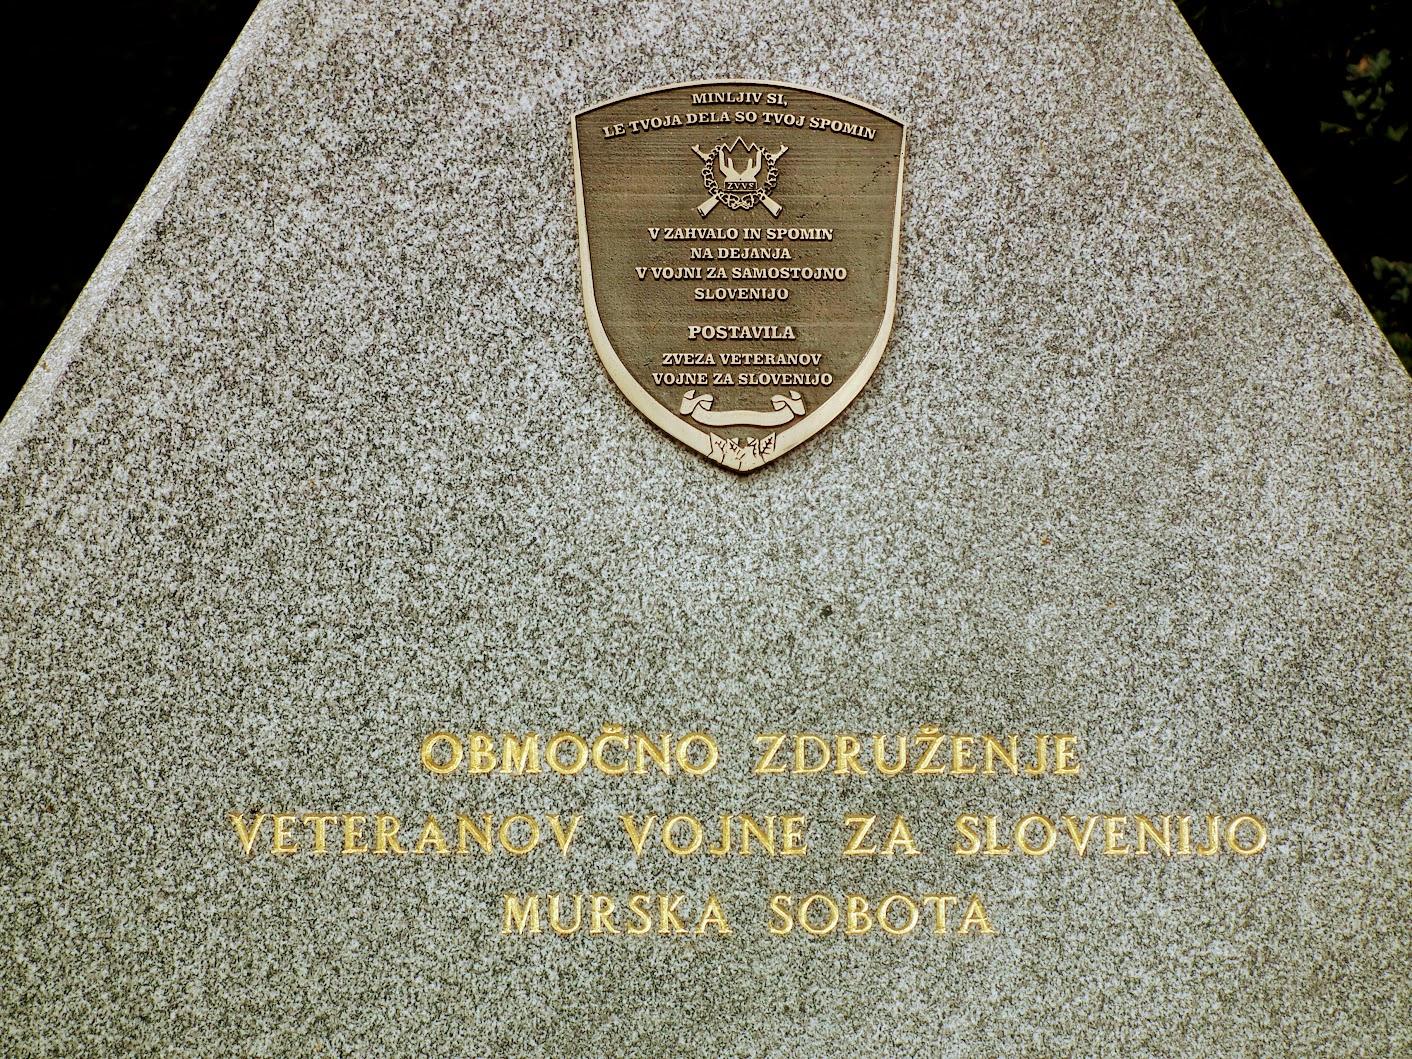 Murska Sobota (Muraszombat) - spomina braniteljem slovenske samostojnosti (Szlovén függetlenségi emlékmű)